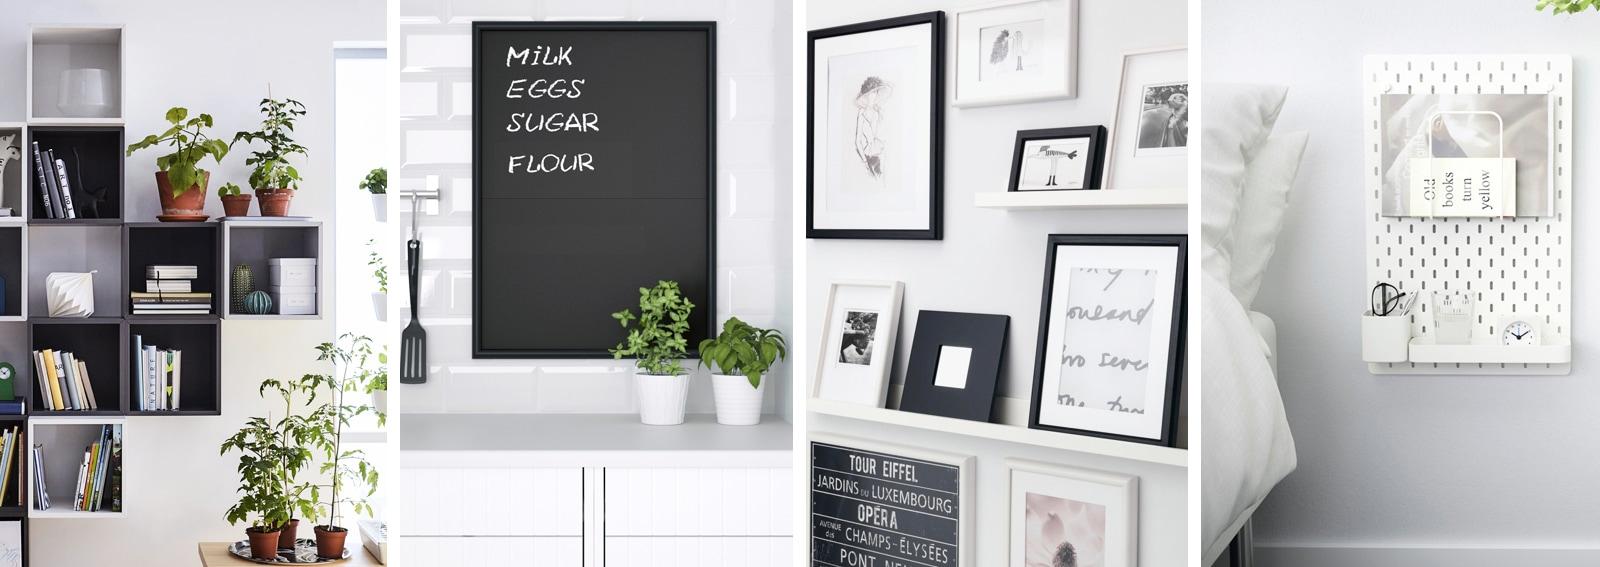 Cover Decorare Pareti Ikea Desktop